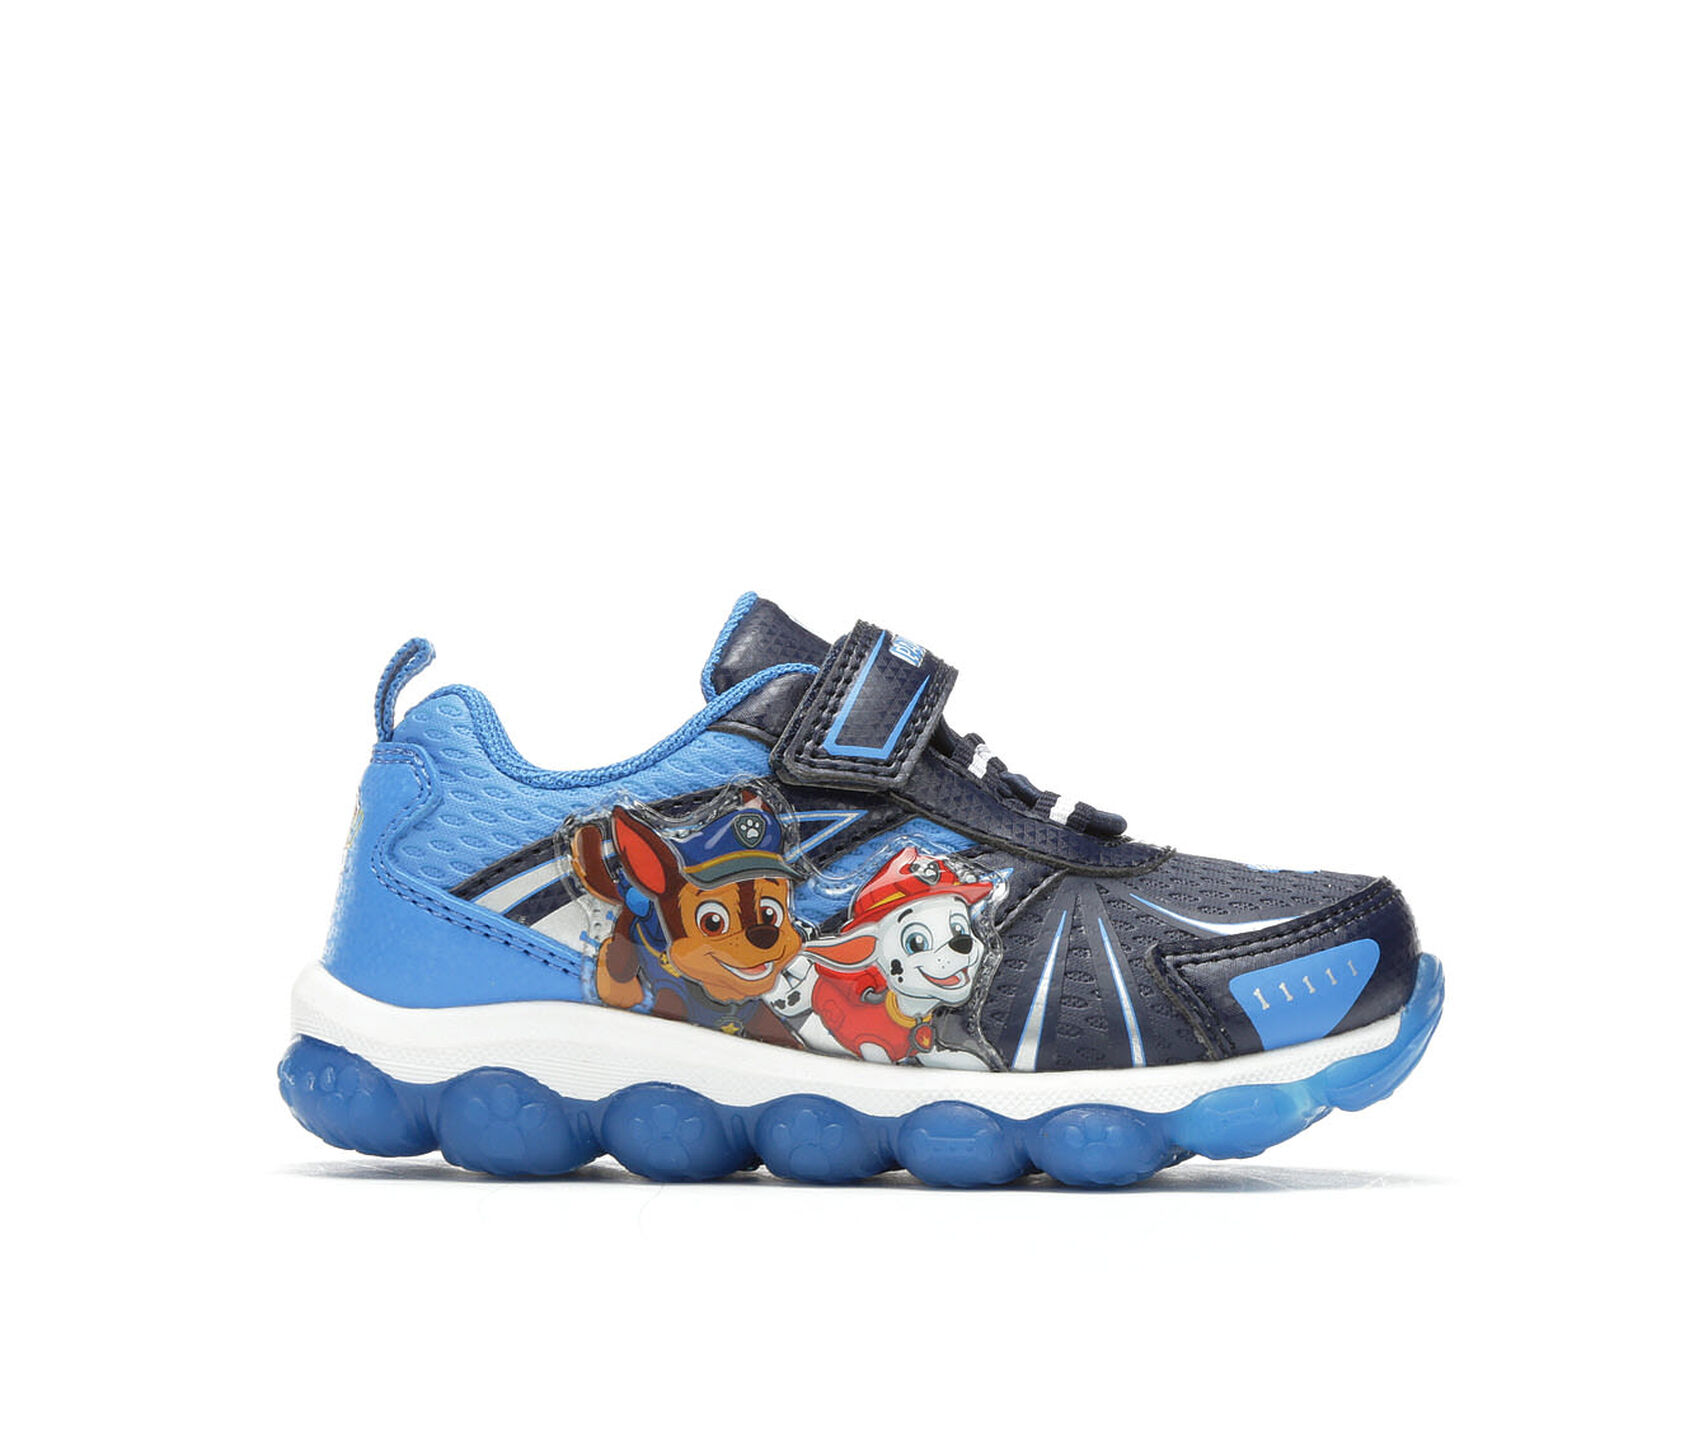 Boys  Nickelodeon Toddler   Little Kid Paw Patrol 3 Light-Up Shoes ... 8c8301231